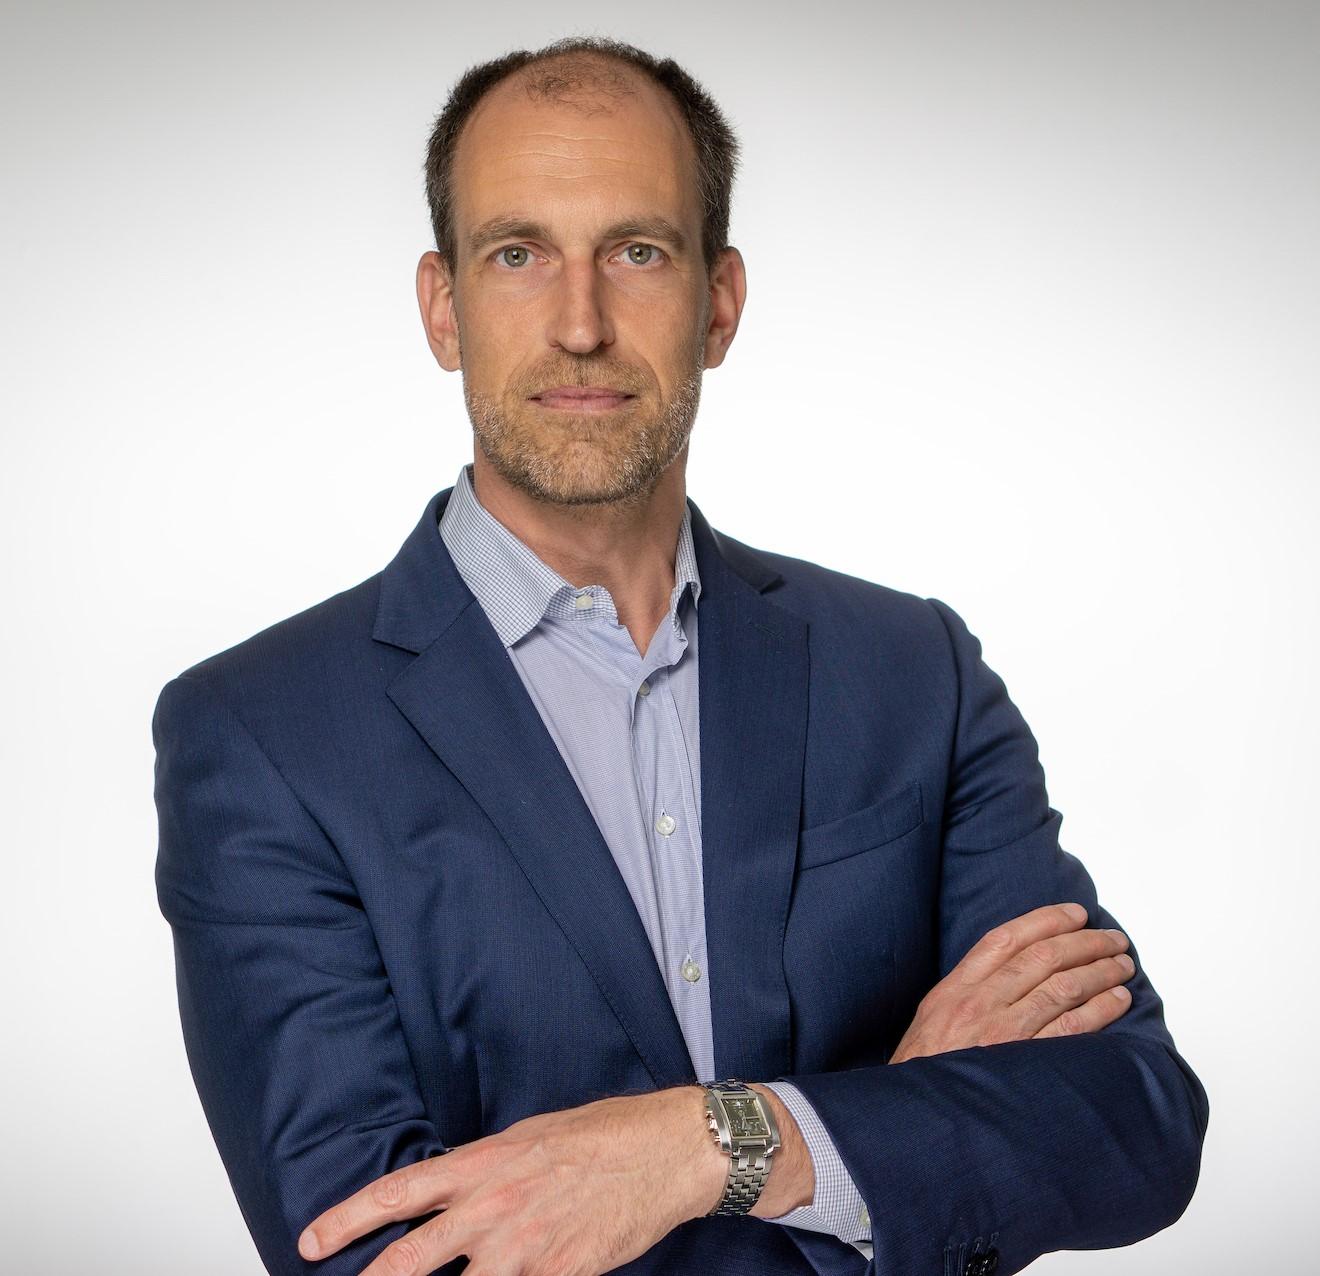 Matthias Riedel